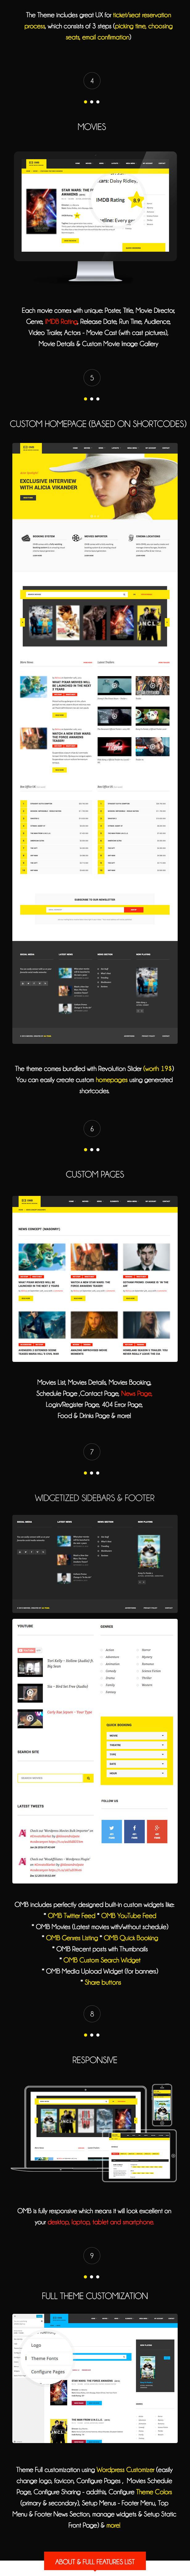 OMB - Online Movies Booking - 5 OMB - Online Movies Booking - omb part2 - OMB – Online Movies Booking